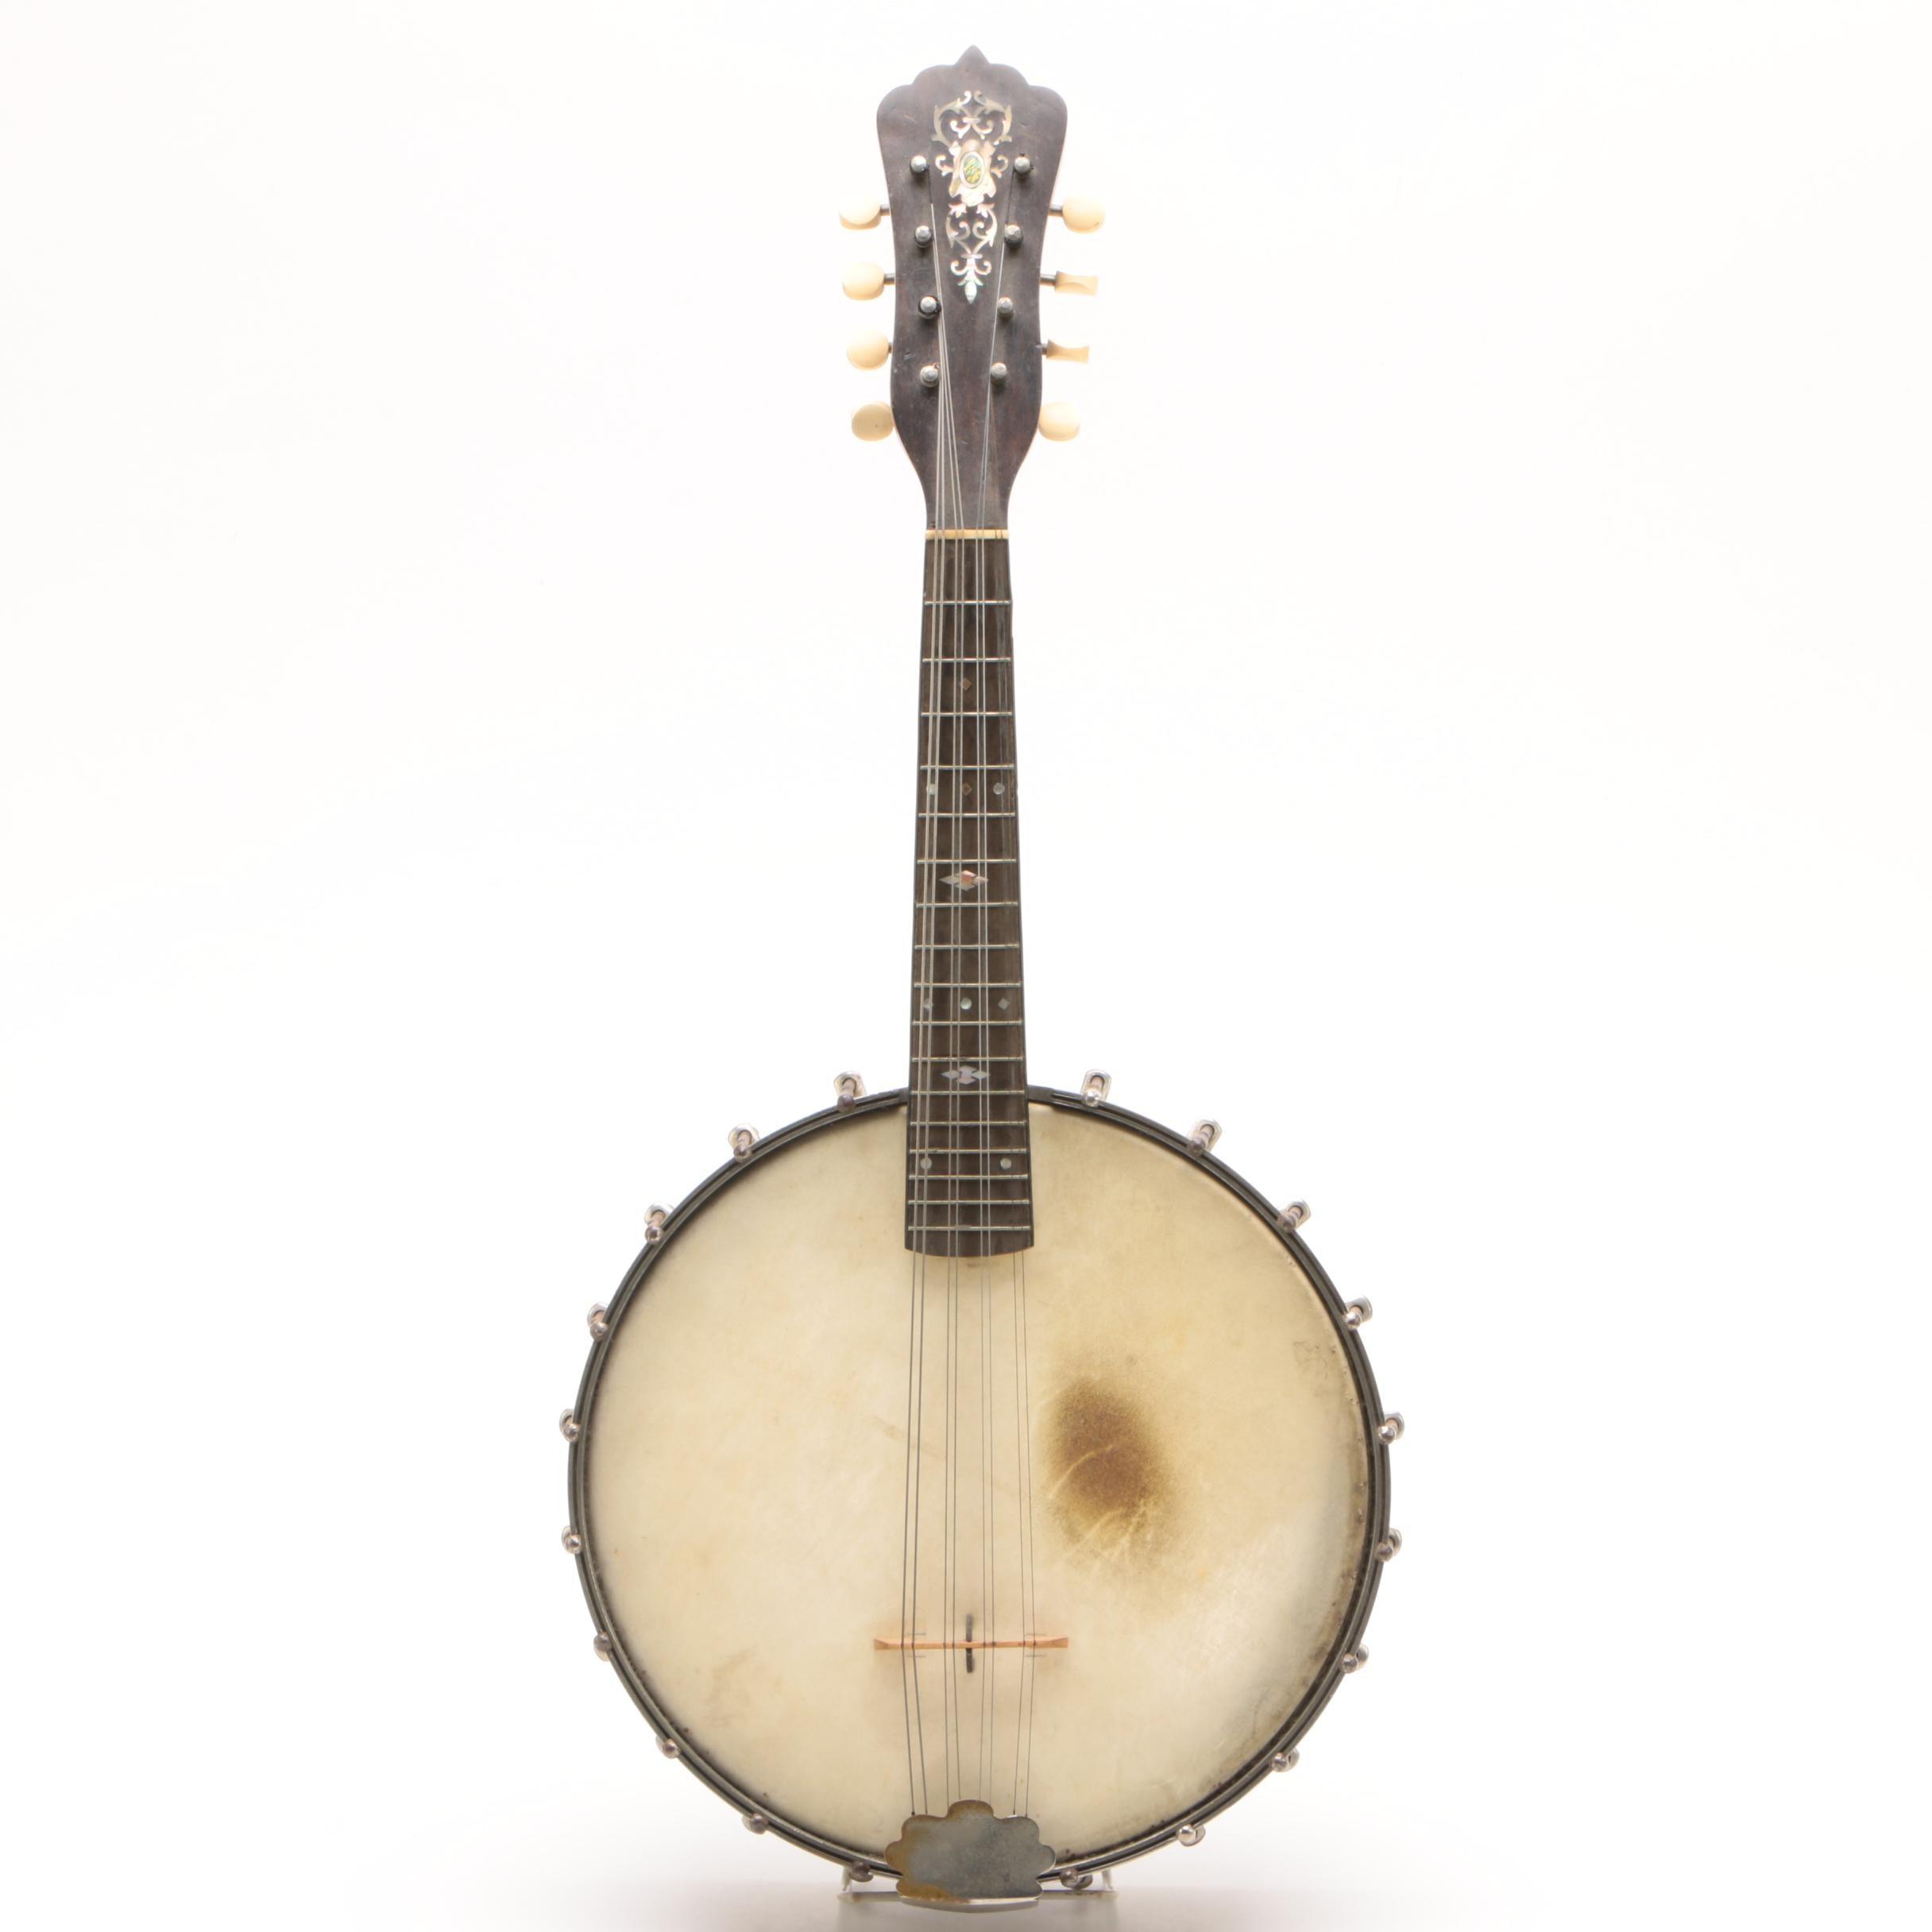 S.S. Stewart Eight-String Banjeaurine, Late 19th Century